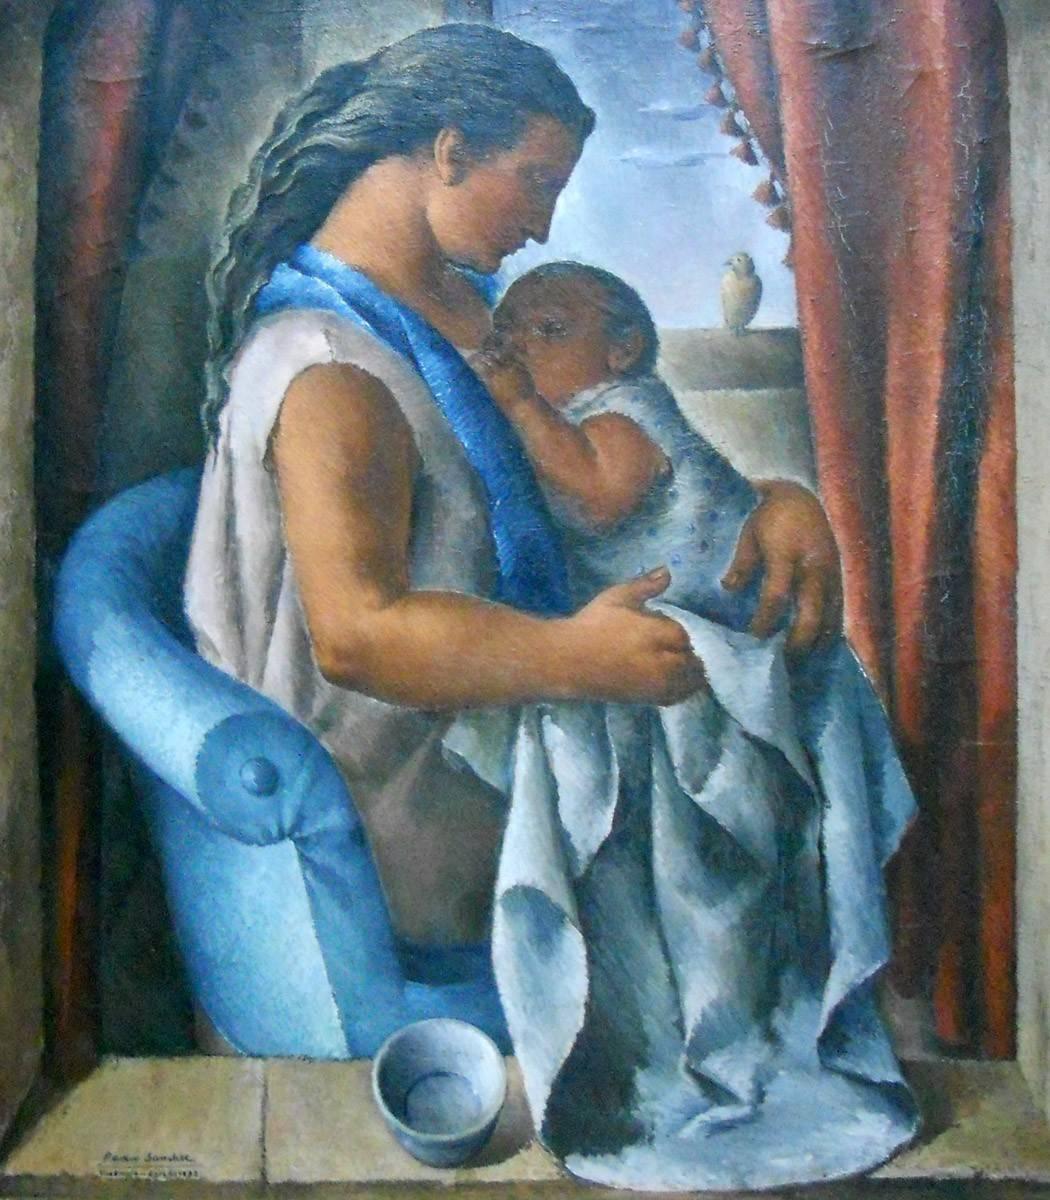 Obra ampliada: Madre latina - Pedro Sánchez